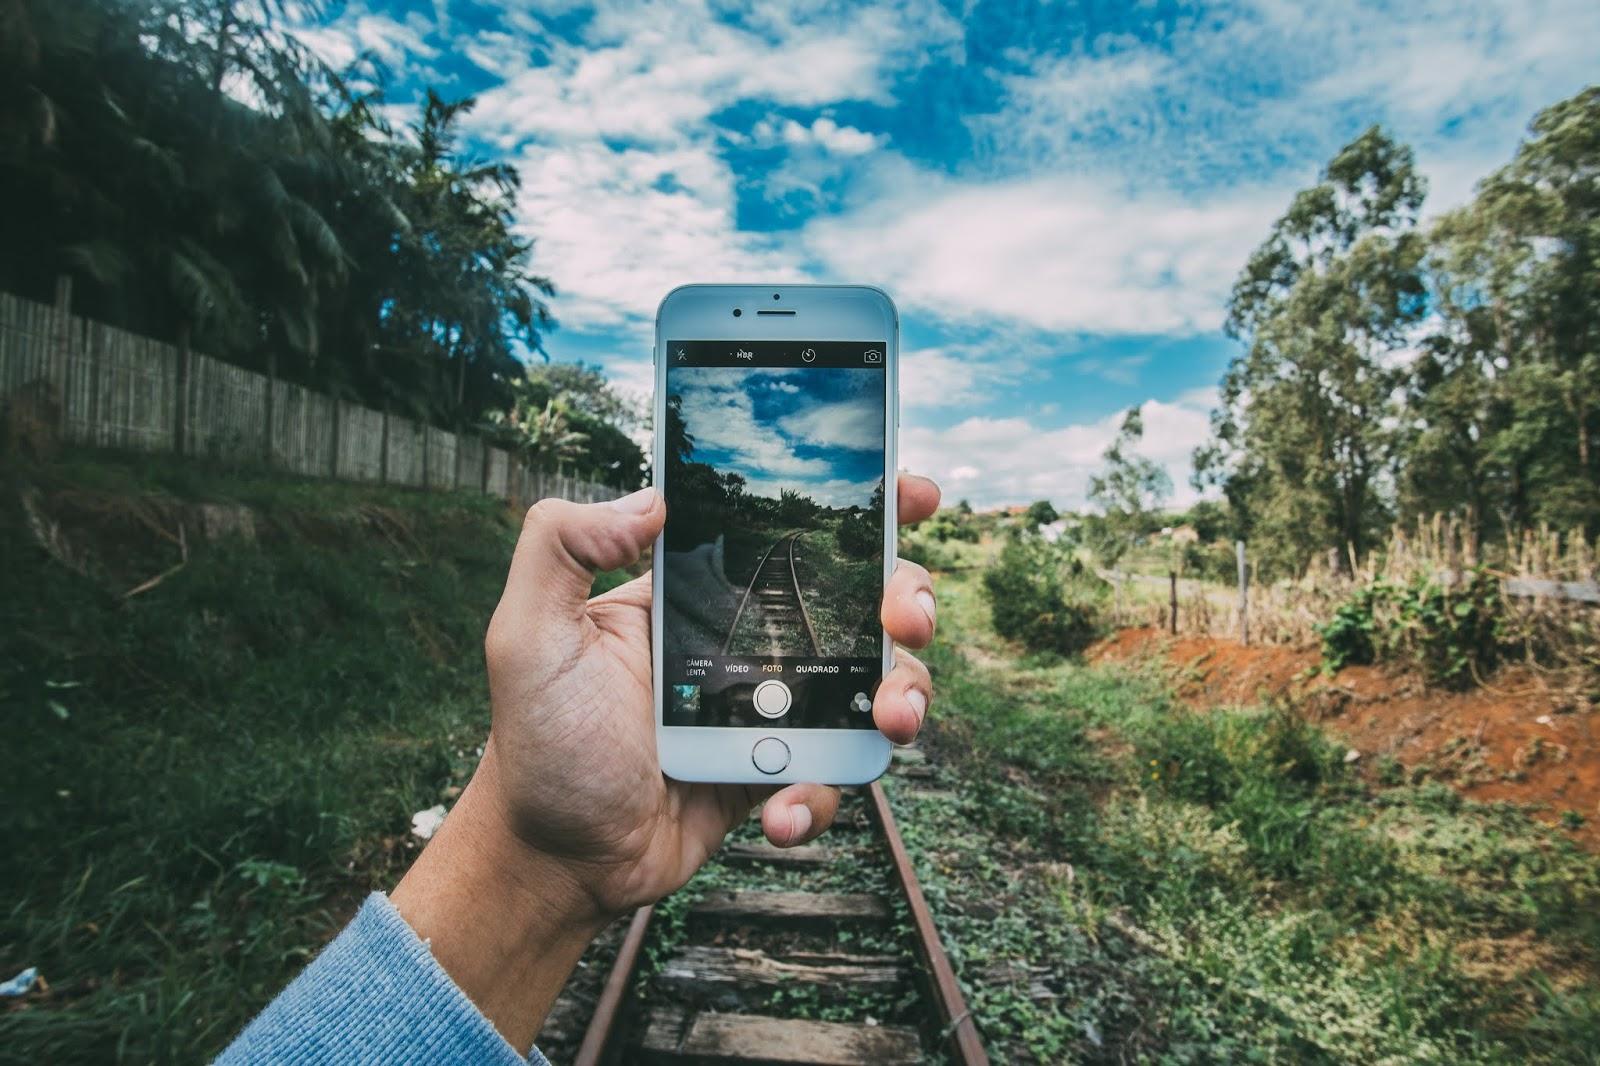 zug auf dem weg kamera apps